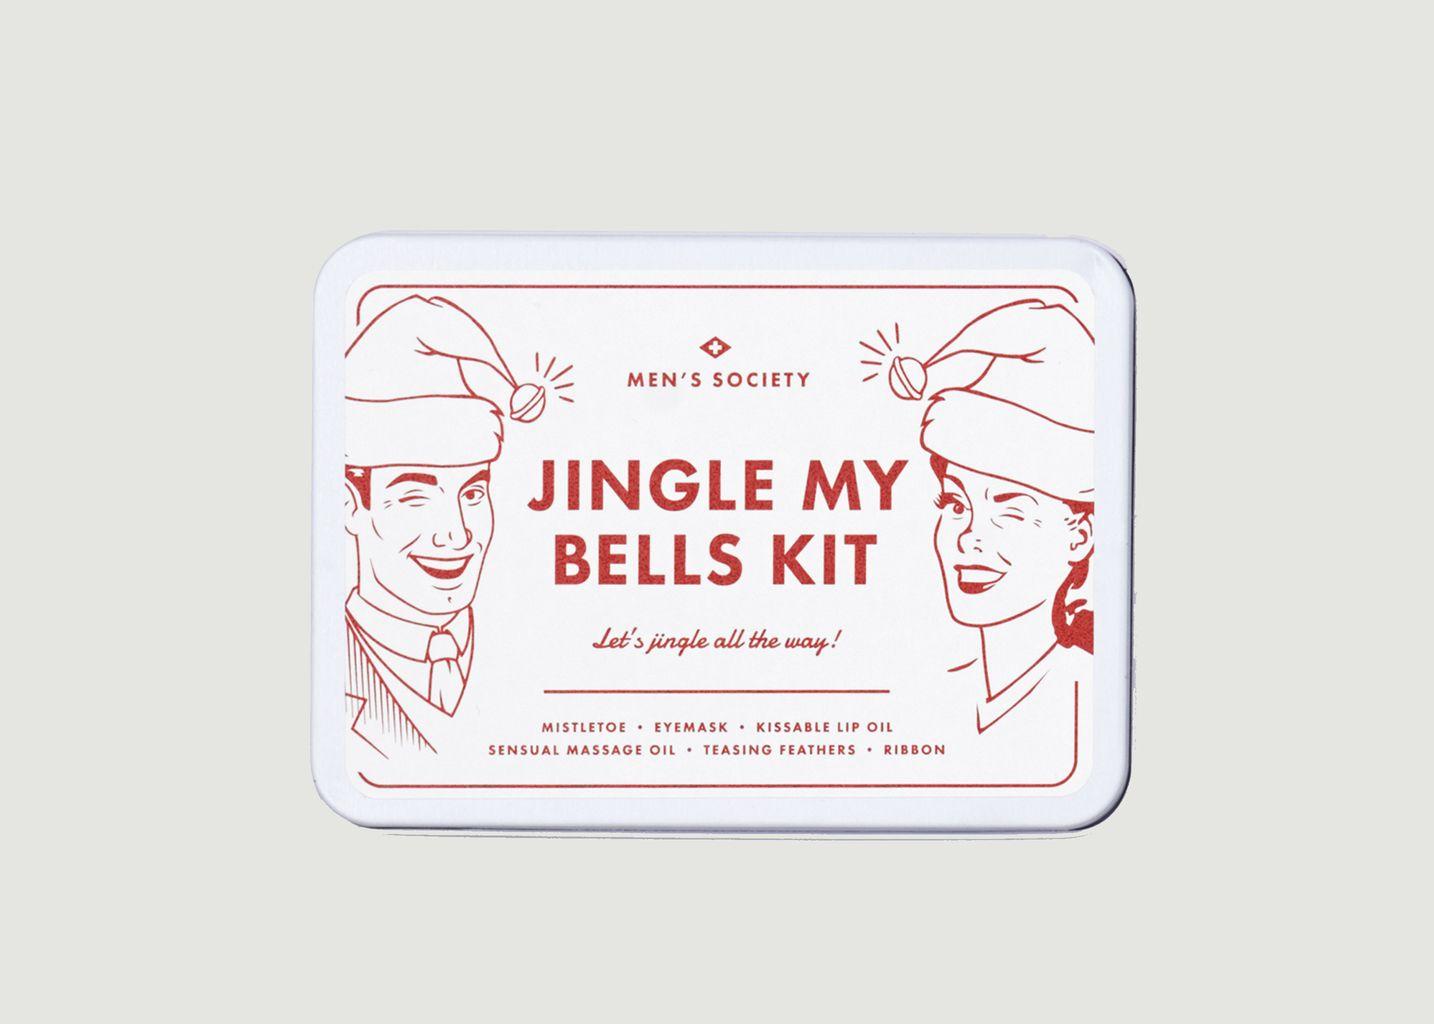 Jingle My Bells Kit - Men's Society